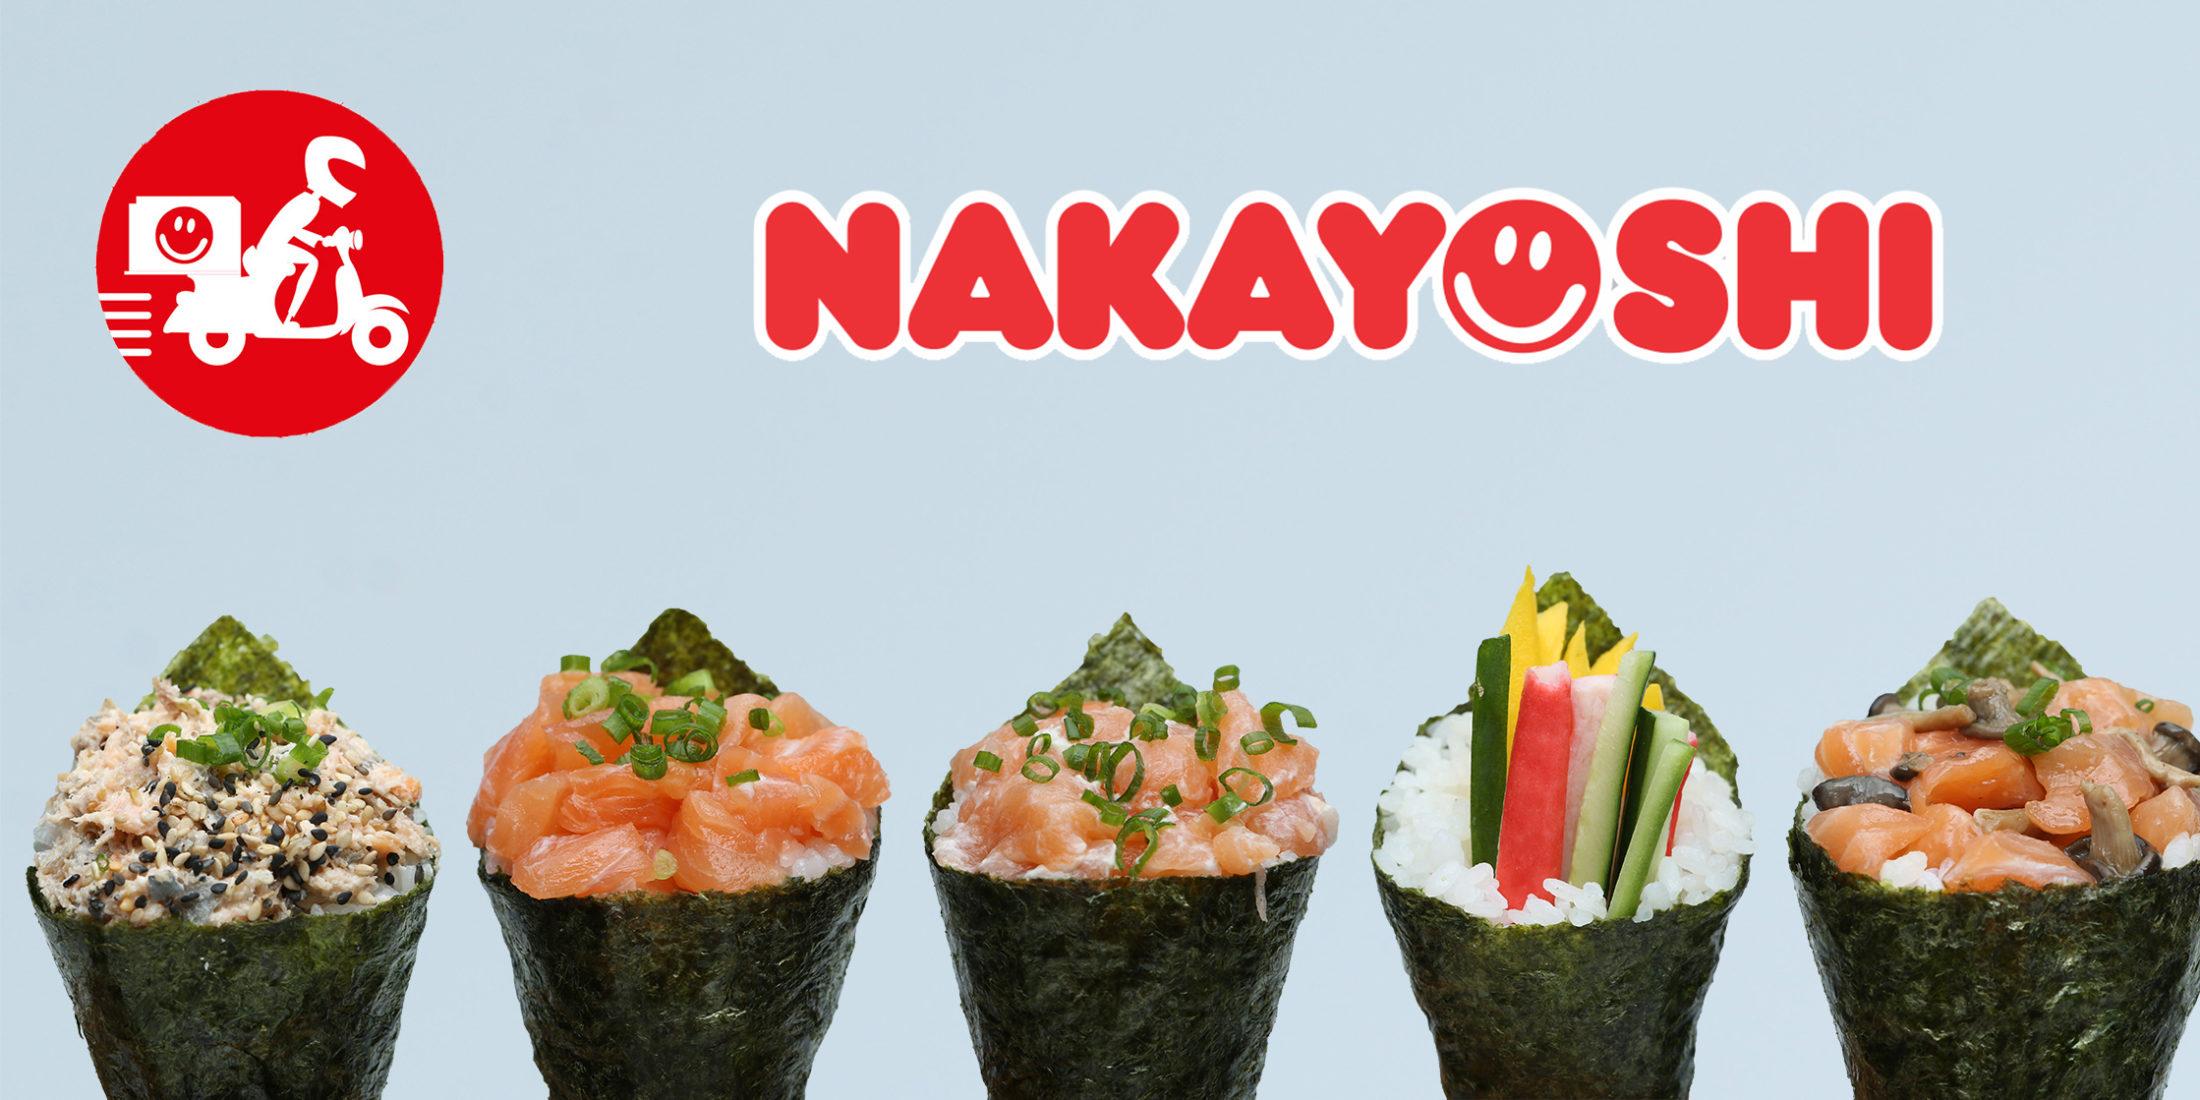 Sushi Delivery no Almoço   Nakayoshi Indaiatuba